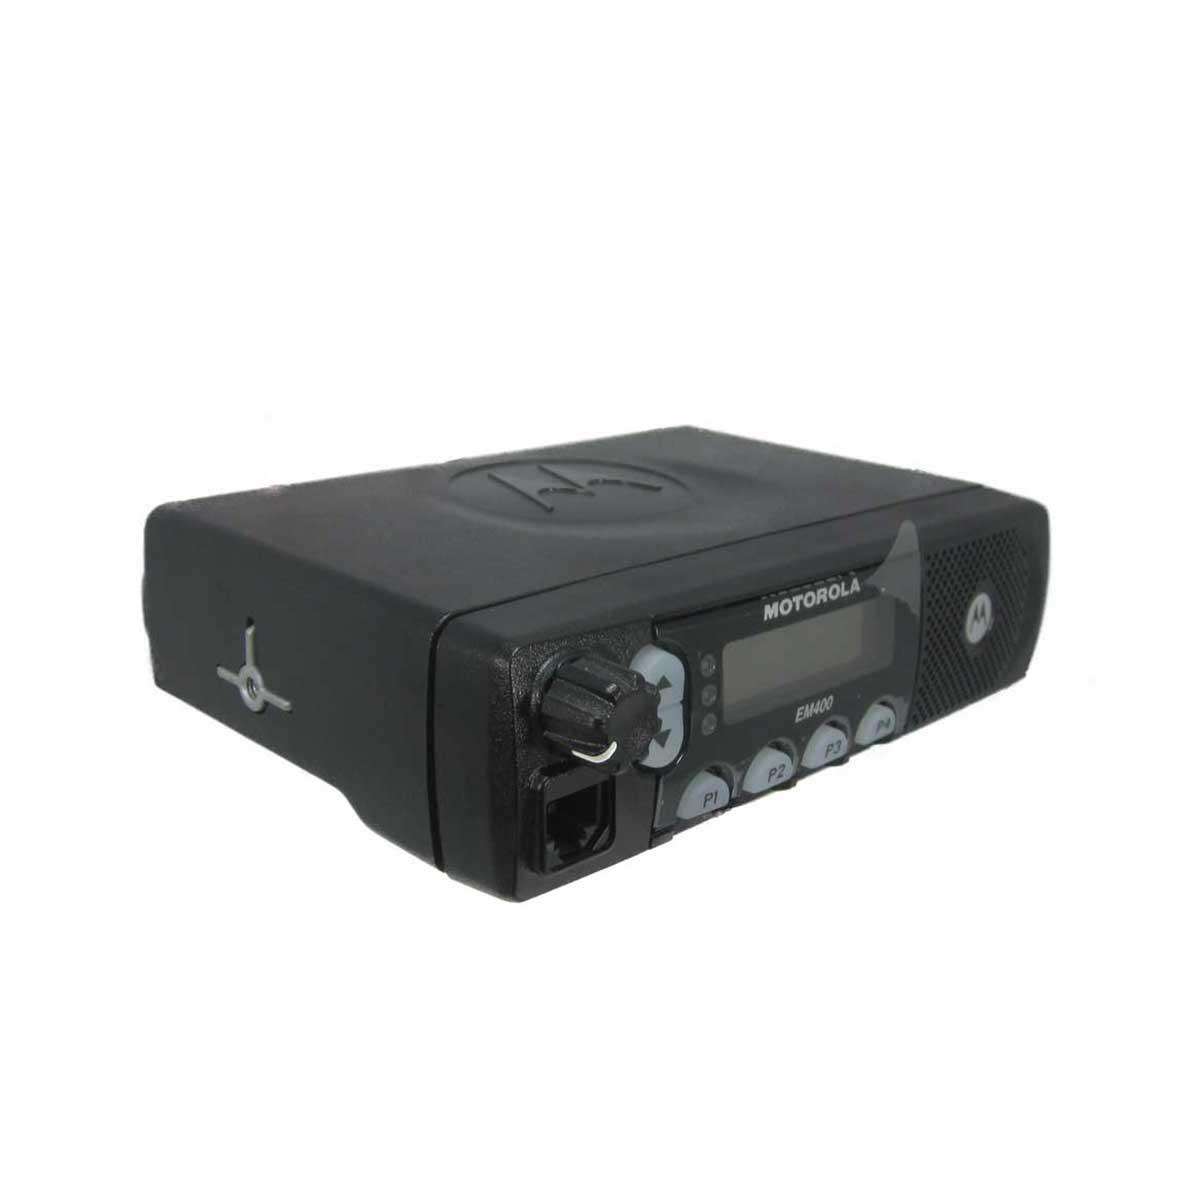 Radio Motorola EM400 Analógico LAM50RNF9AA1AN UHF 438-470 MHz